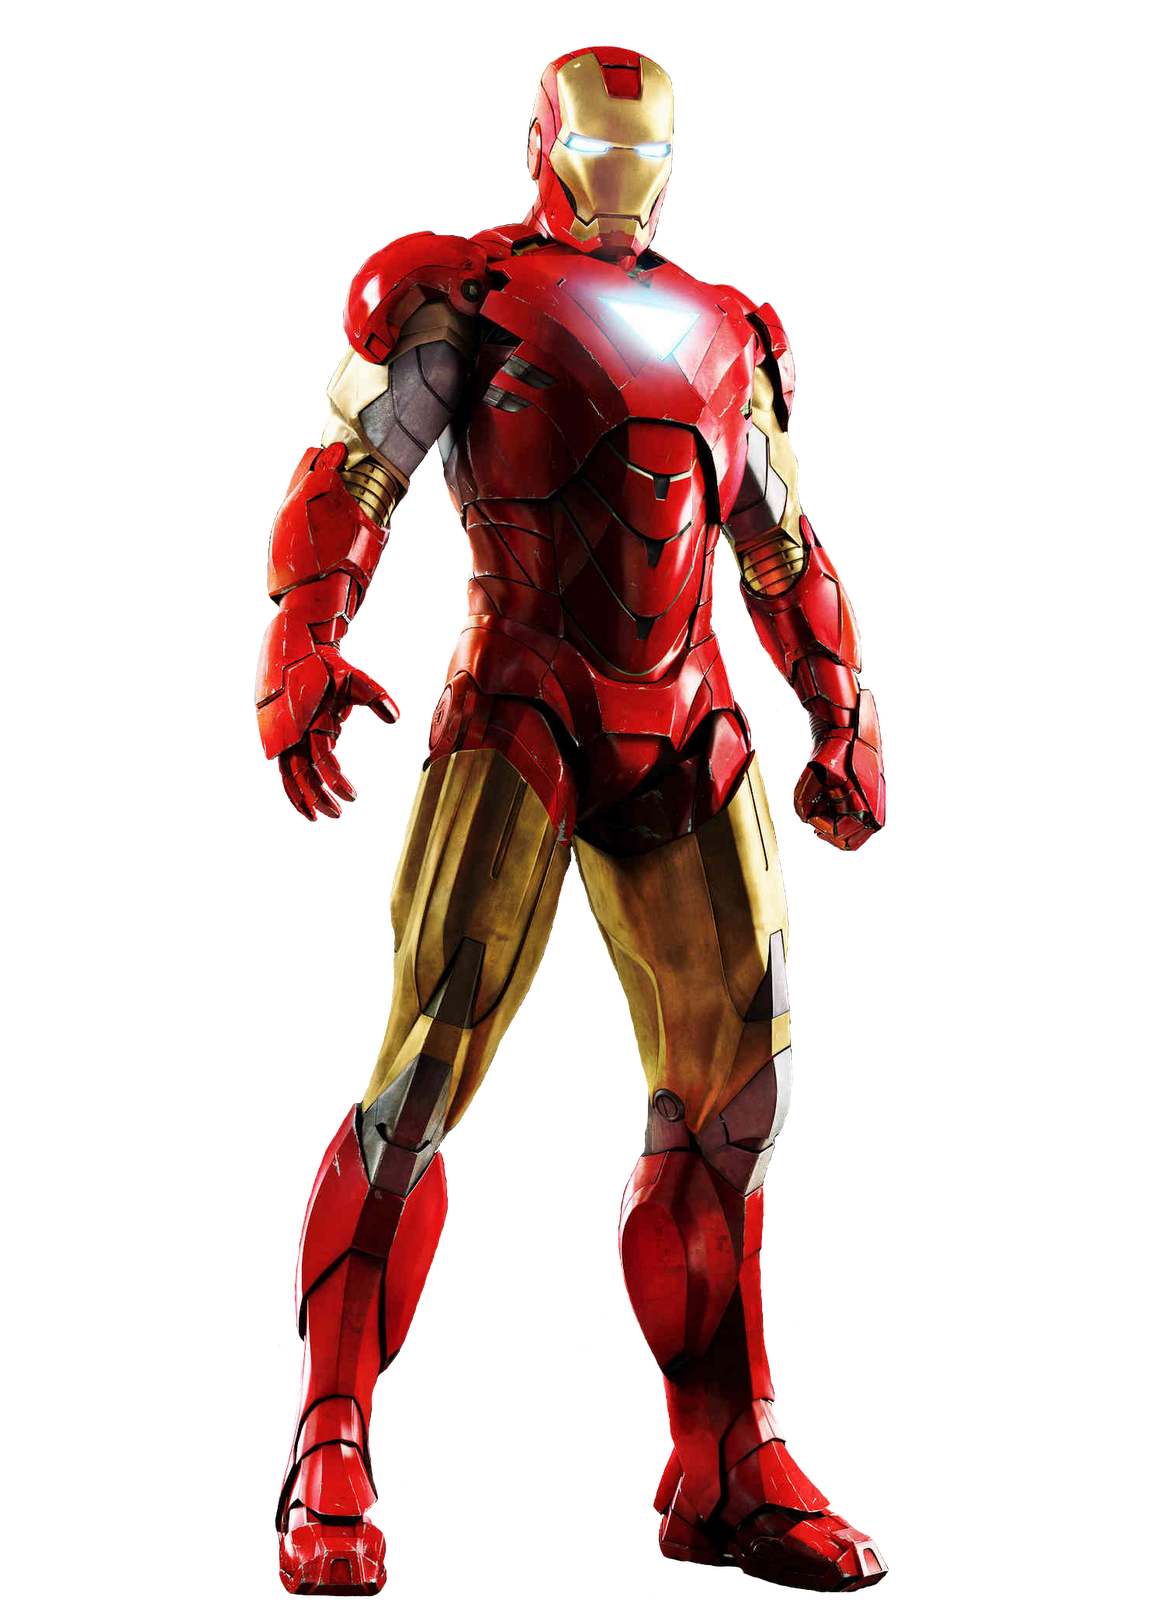 Iron Man Heroes wiki, Iron man fan art and Comic